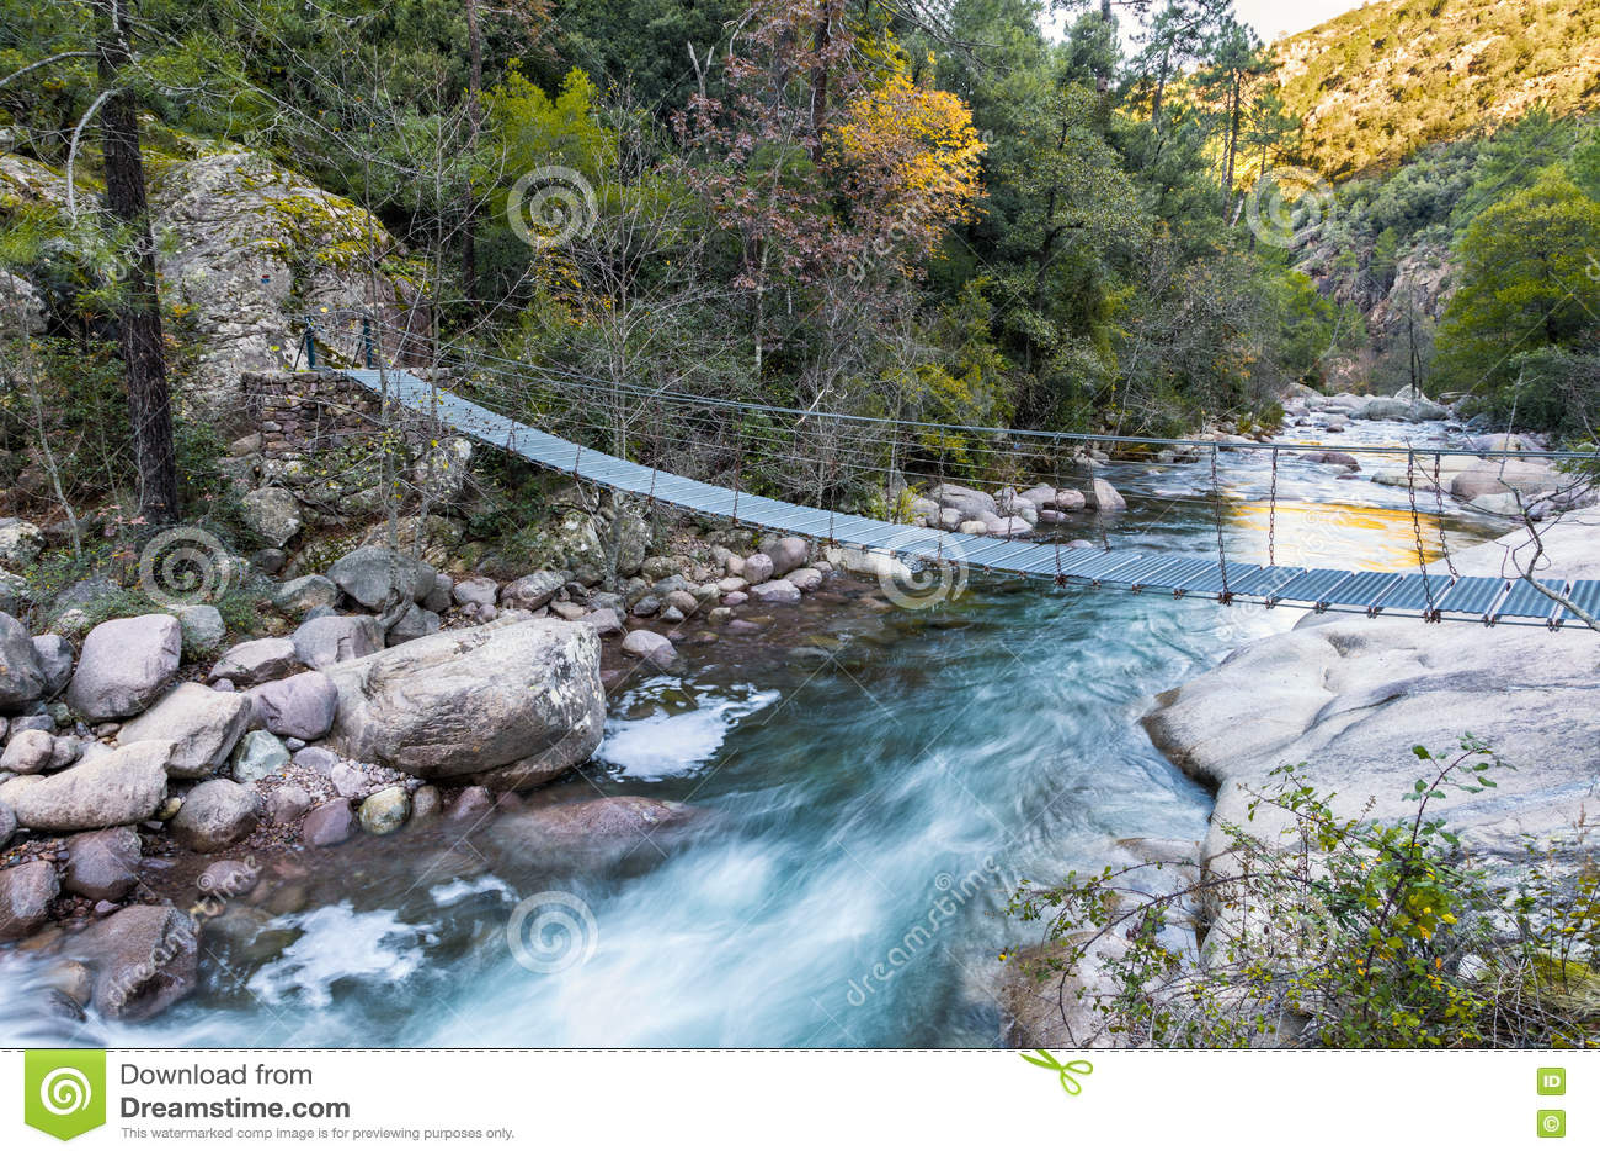 Drahtseilbrücke über La Figarella Bei Bonifatu In Korsika Stockfoto ...